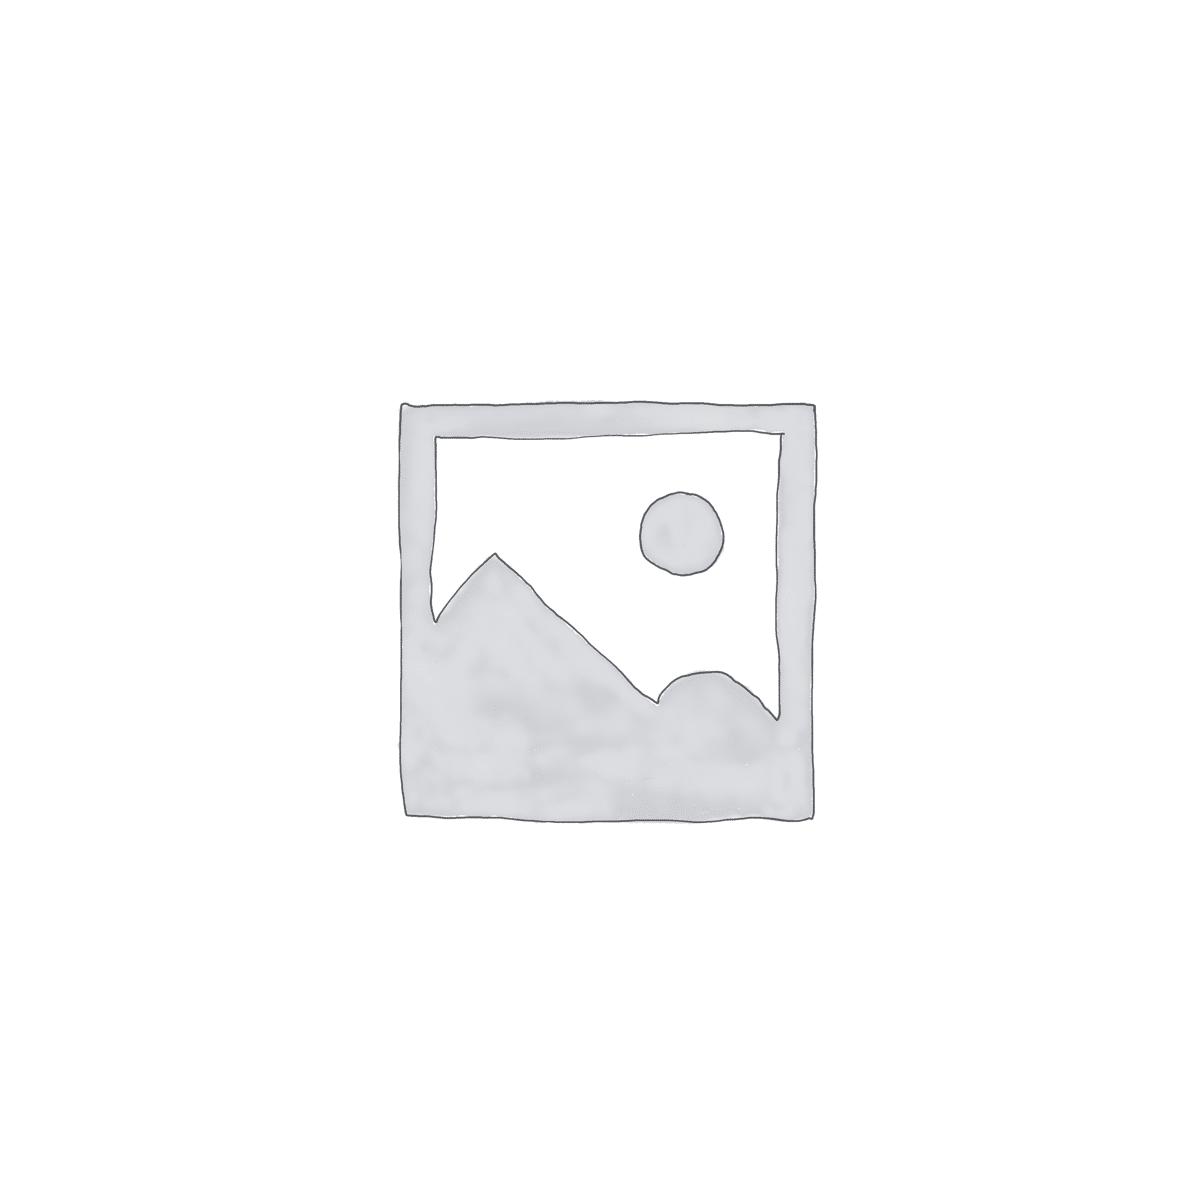 Ardbeg Corryvreckan Single Malt